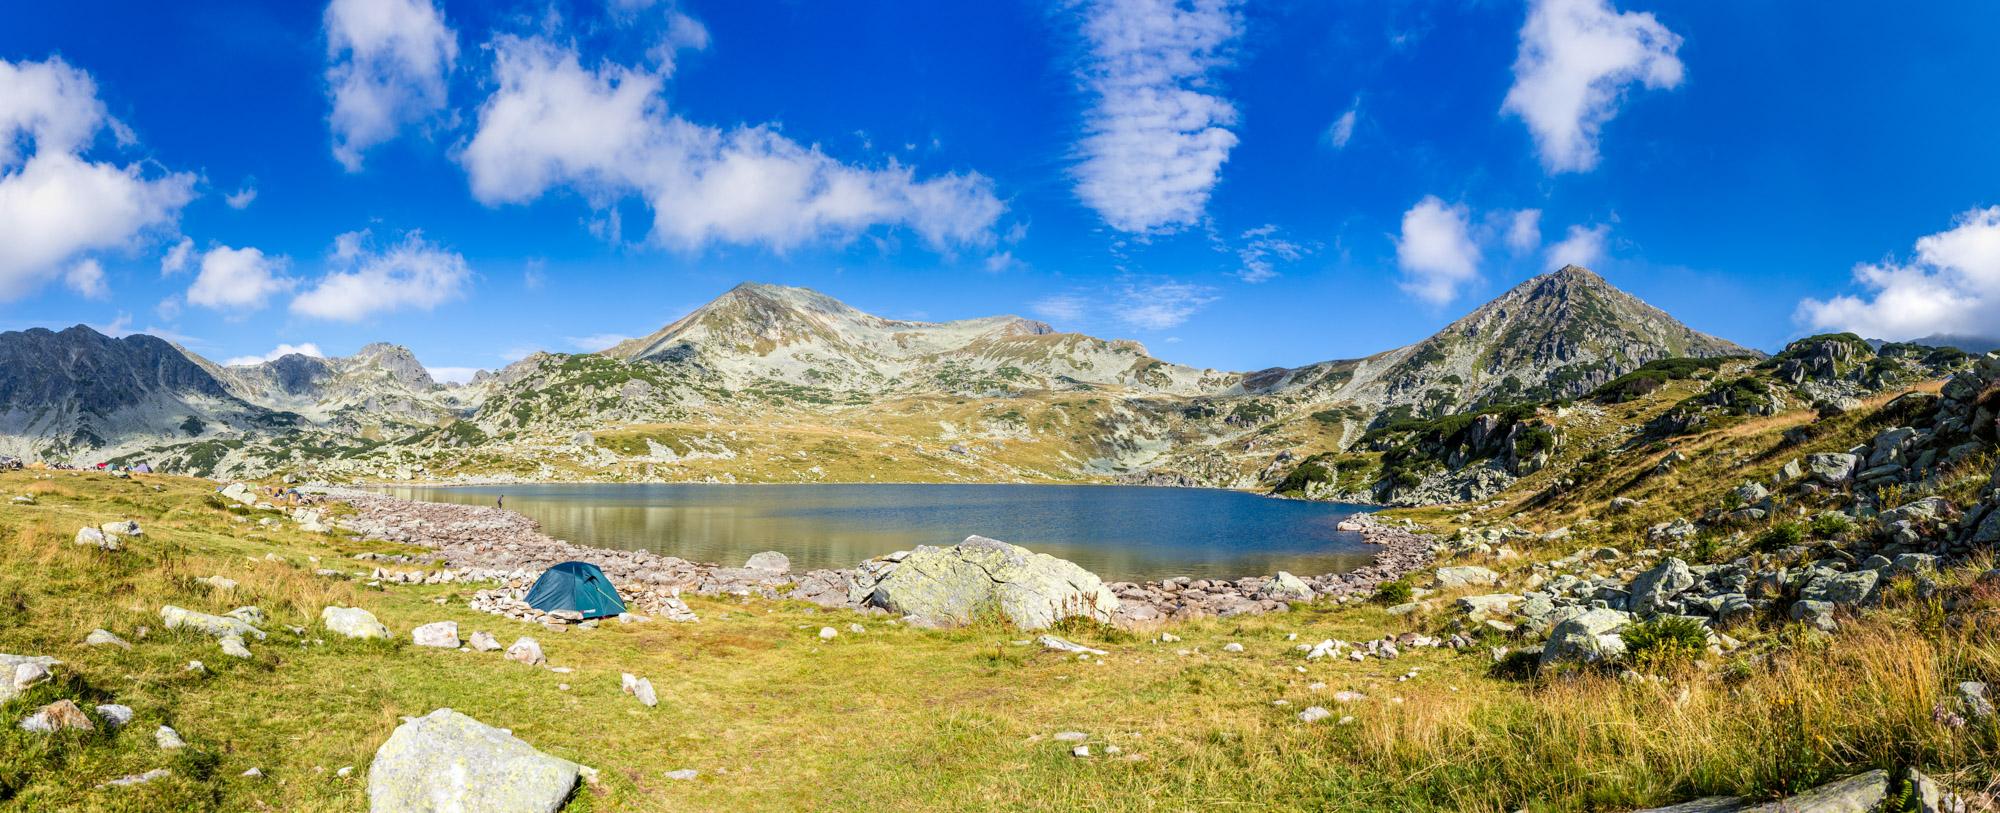 Retezat, Carpathian Mountains, Romania